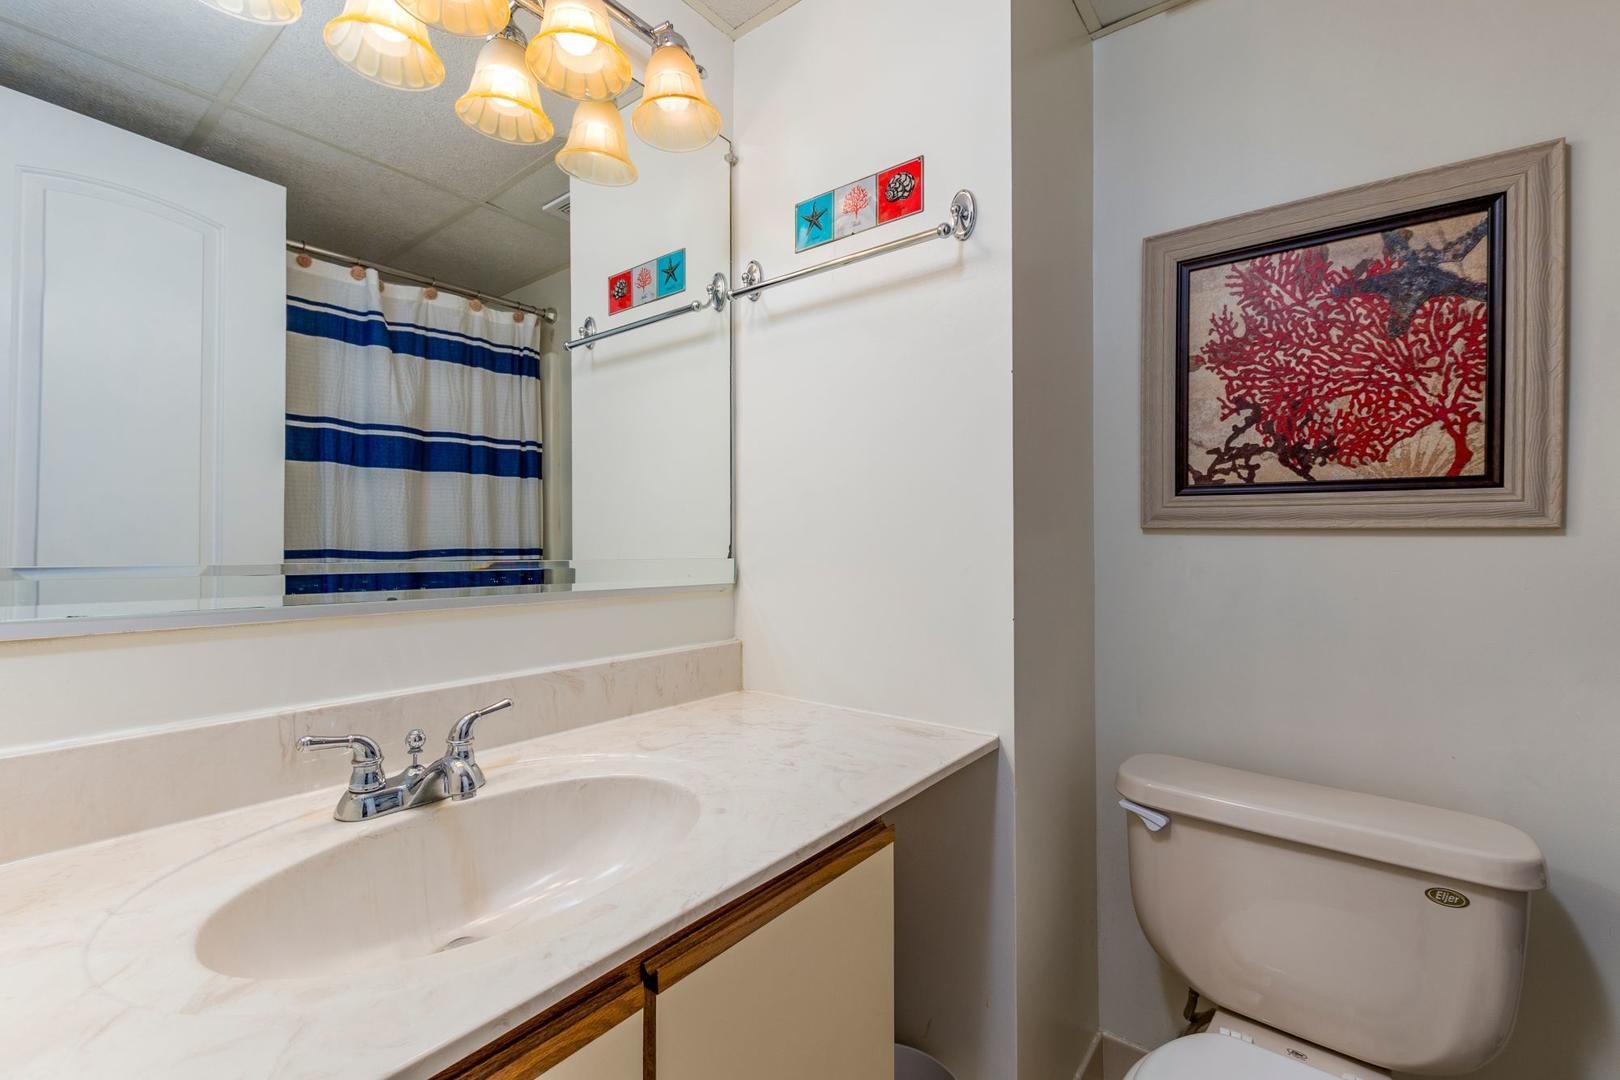 Surfcaster 401 - Bathroom 2